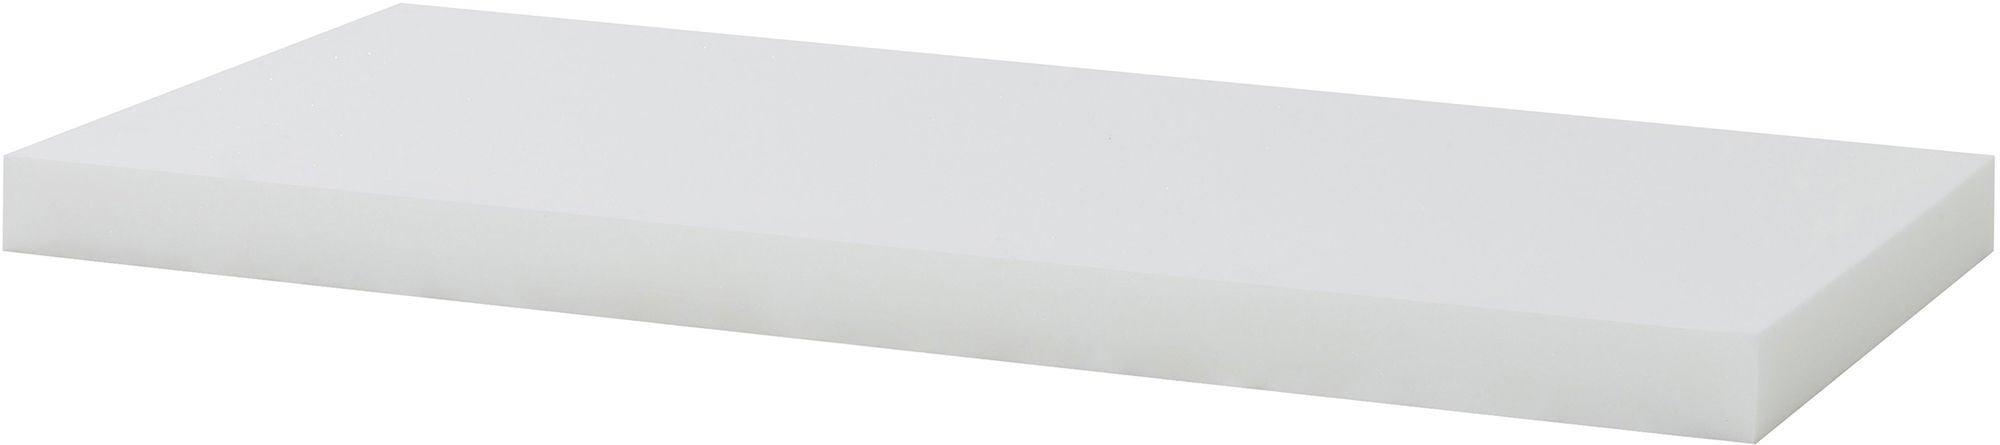 Hoppekids Vaahtomuovipatja 70x160